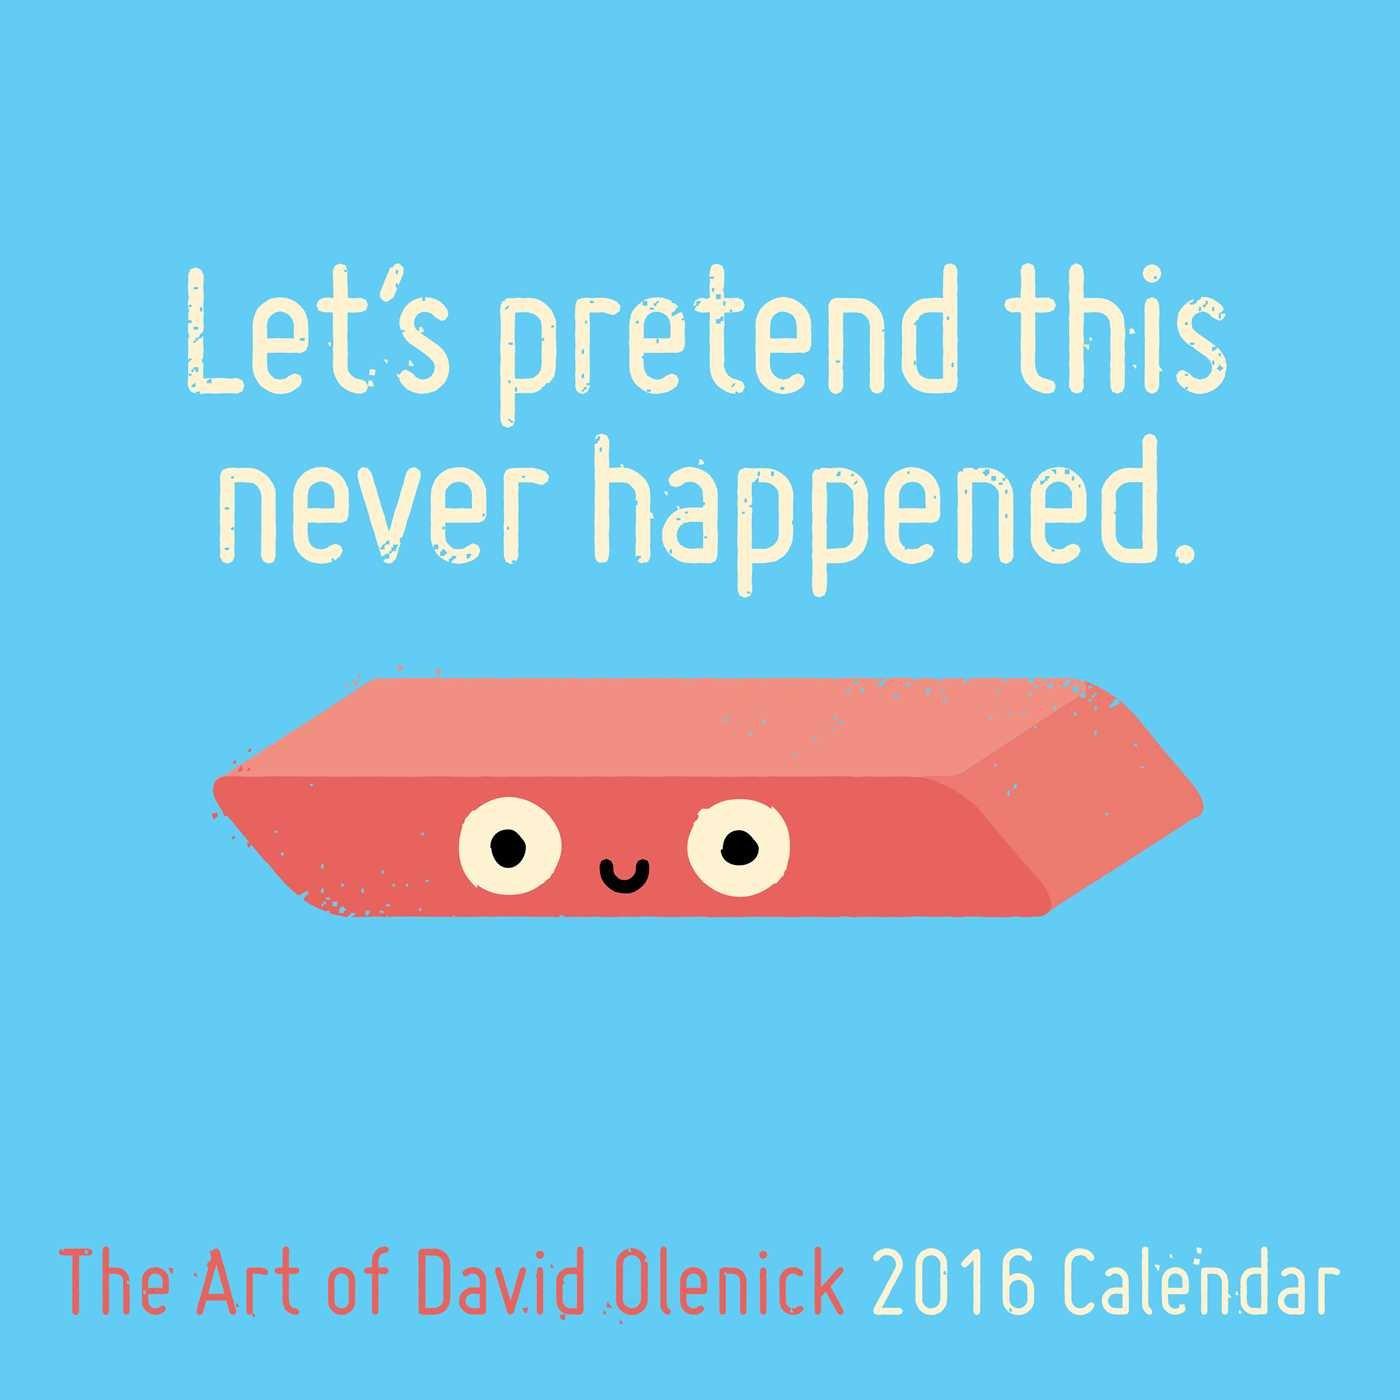 Let's Pretend This Never Happened: The Art of David Olenick 2016 Wall  Calendar: David Olenick: 9781449465353: Books - Amazon.ca